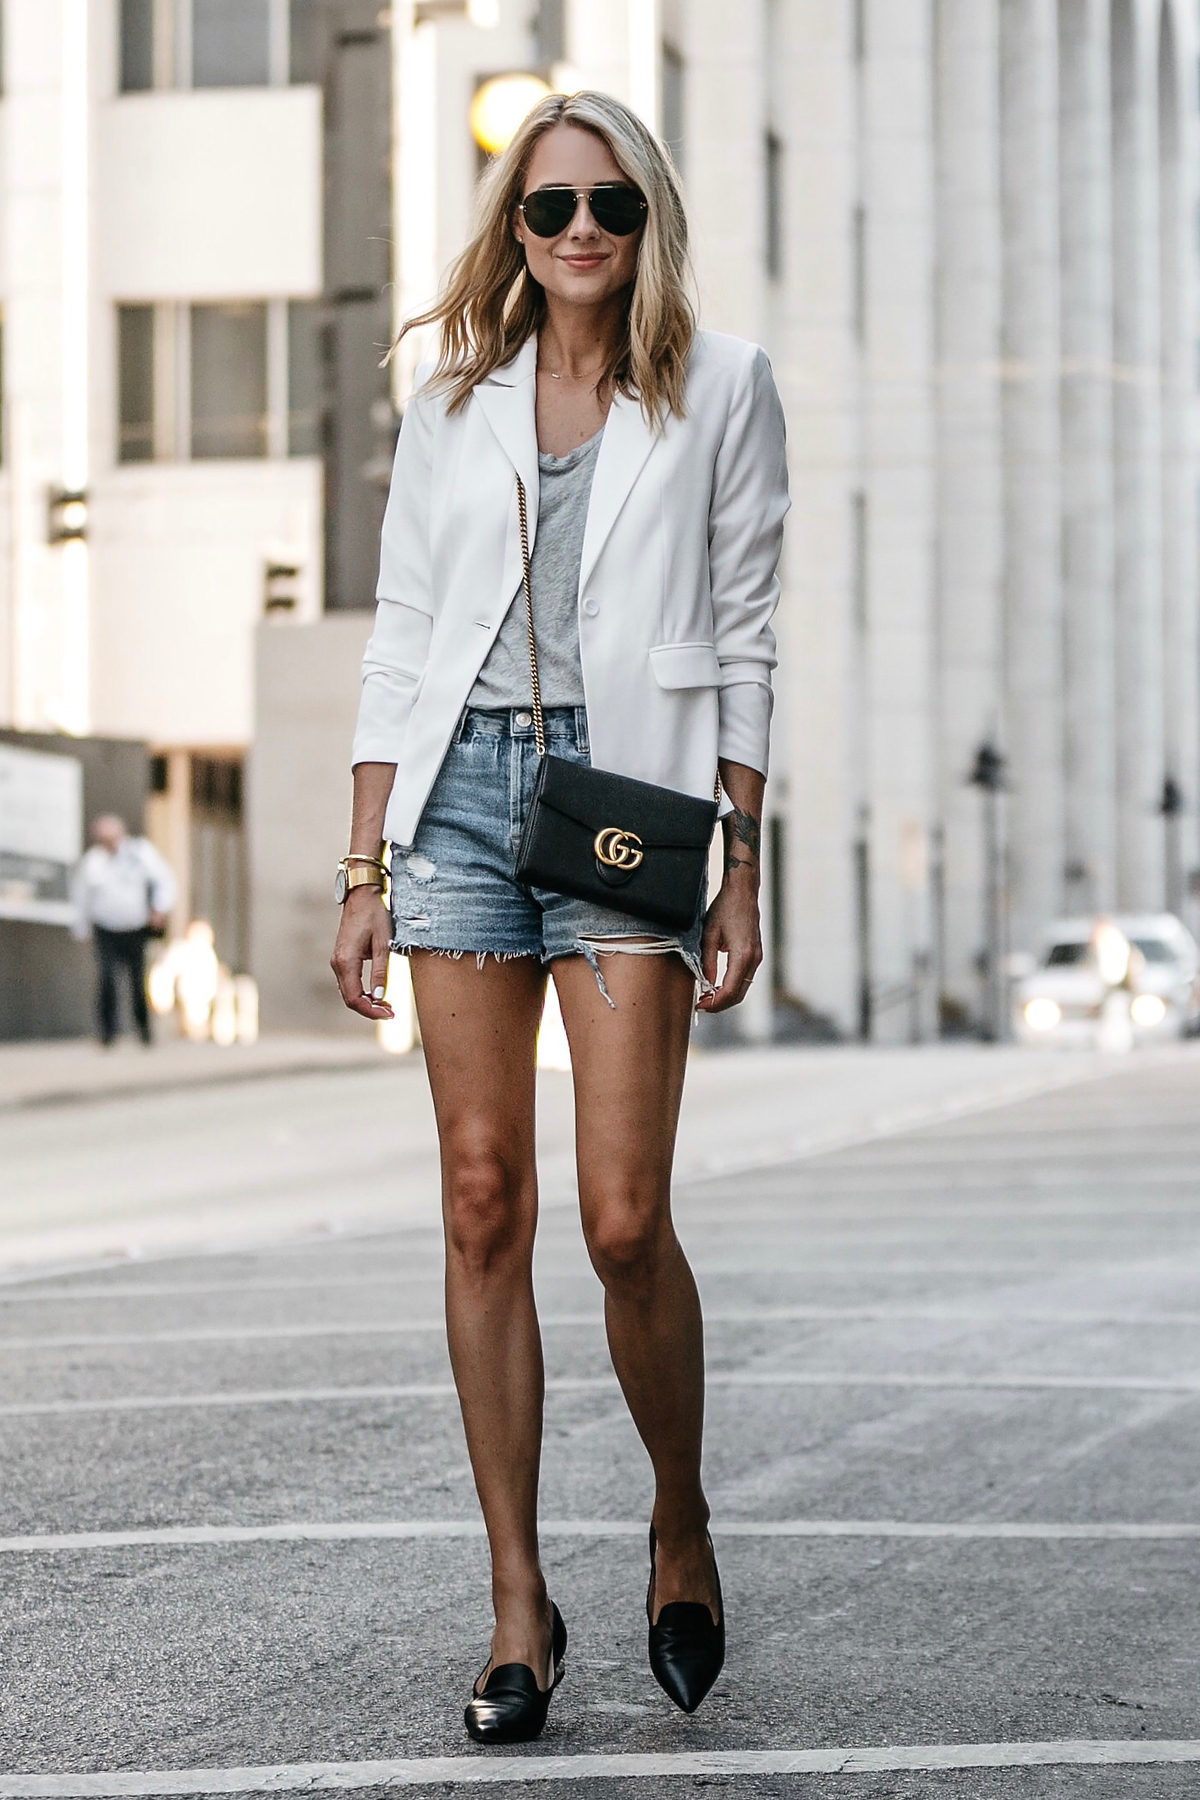 Blonde Woman Wearing Nordstrom White Blazer Everlane Grey Tshirt Topshop Ripped Denim Shorts Outfit Gucci Marmont Handbag Black Loafers Fashion Jackson Dallas Blogger Fashion Blogger Street Style